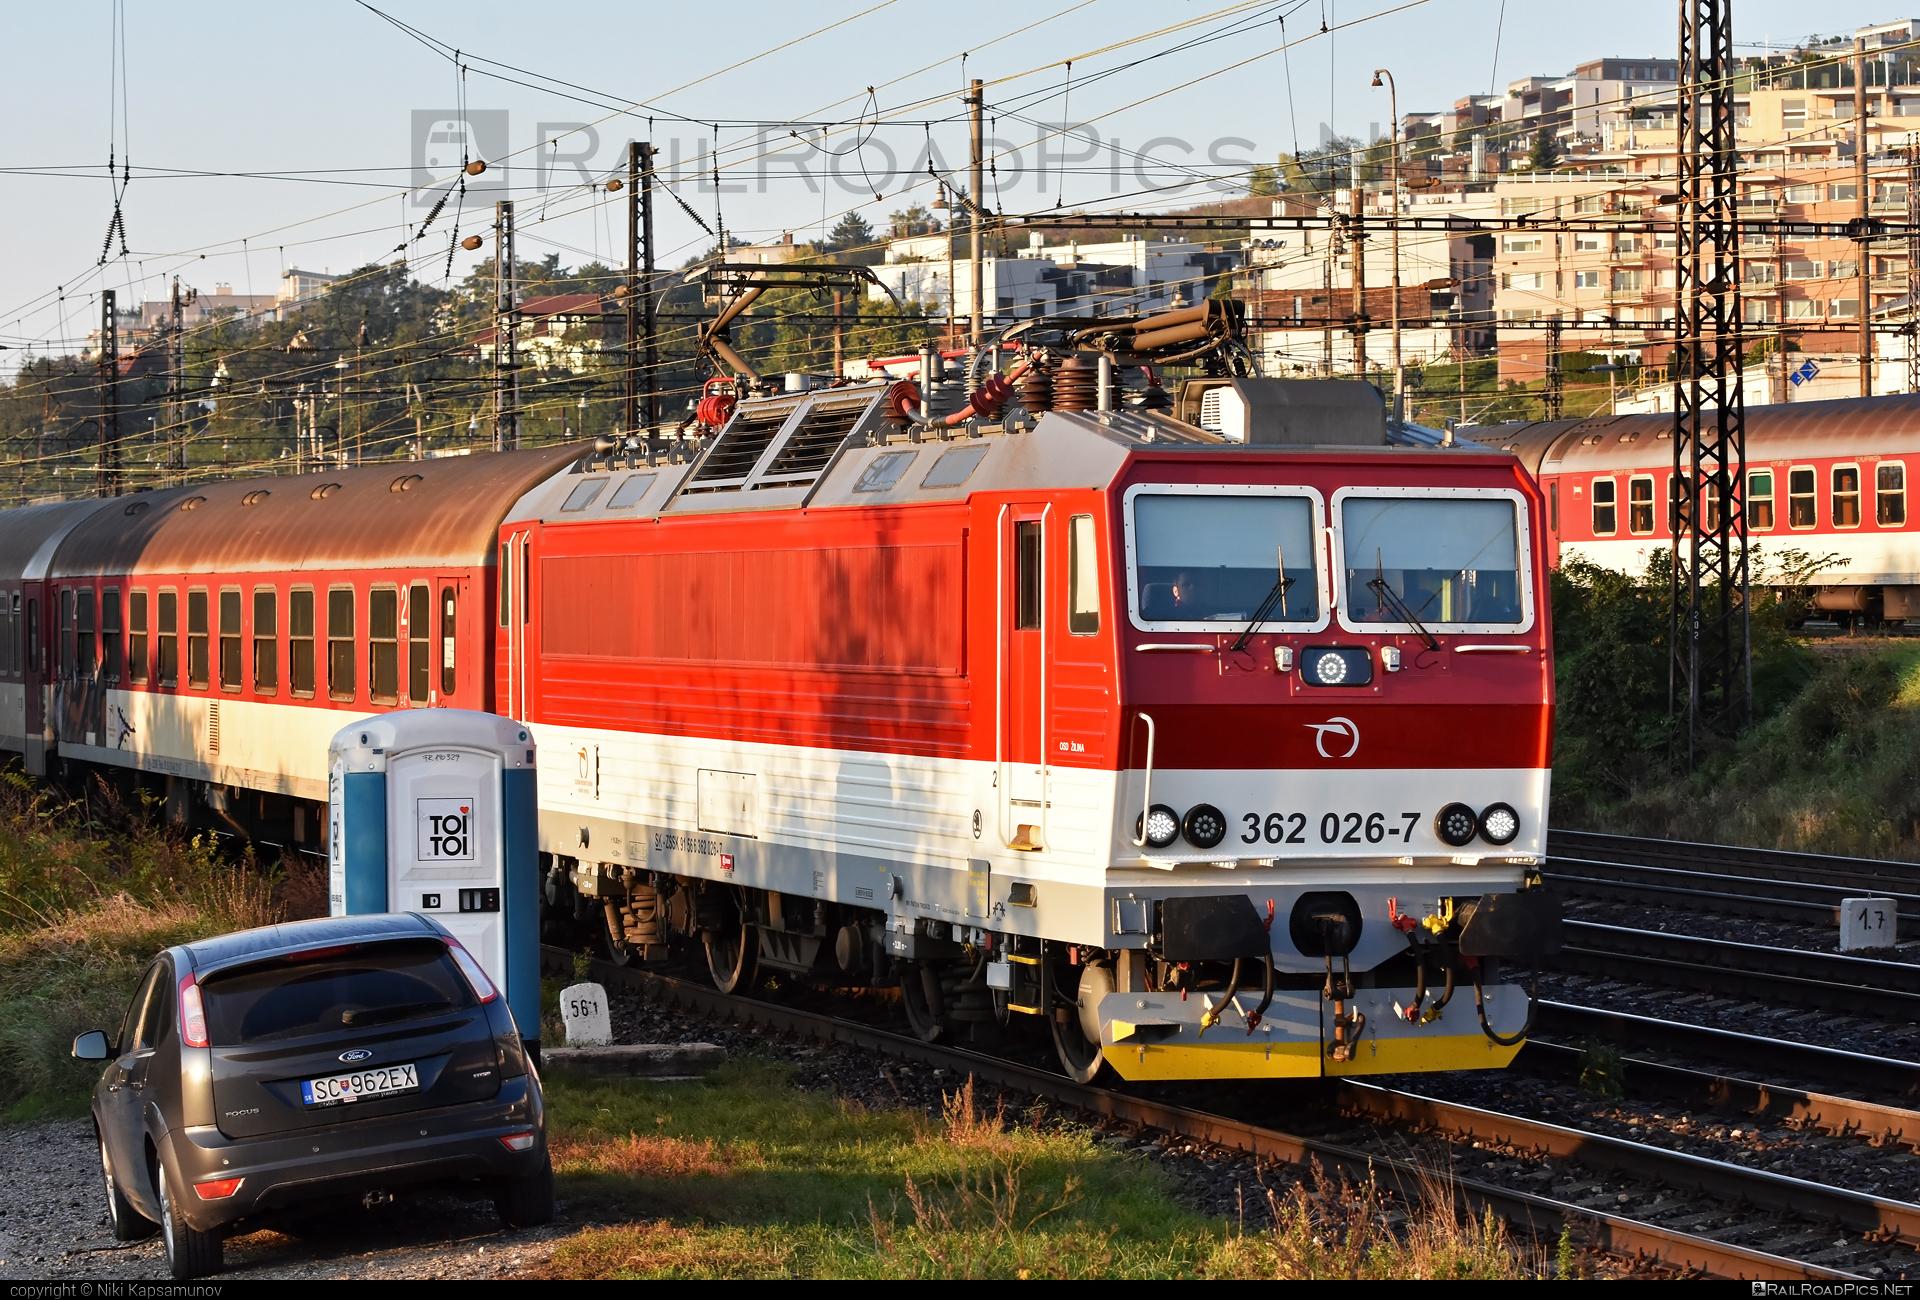 Škoda 69Er - 362 026-7 operated by Železničná Spoločnost' Slovensko, a.s. #ZeleznicnaSpolocnostSlovensko #eso #locomotive362 #rychleeso #skoda #skoda69er #zssk